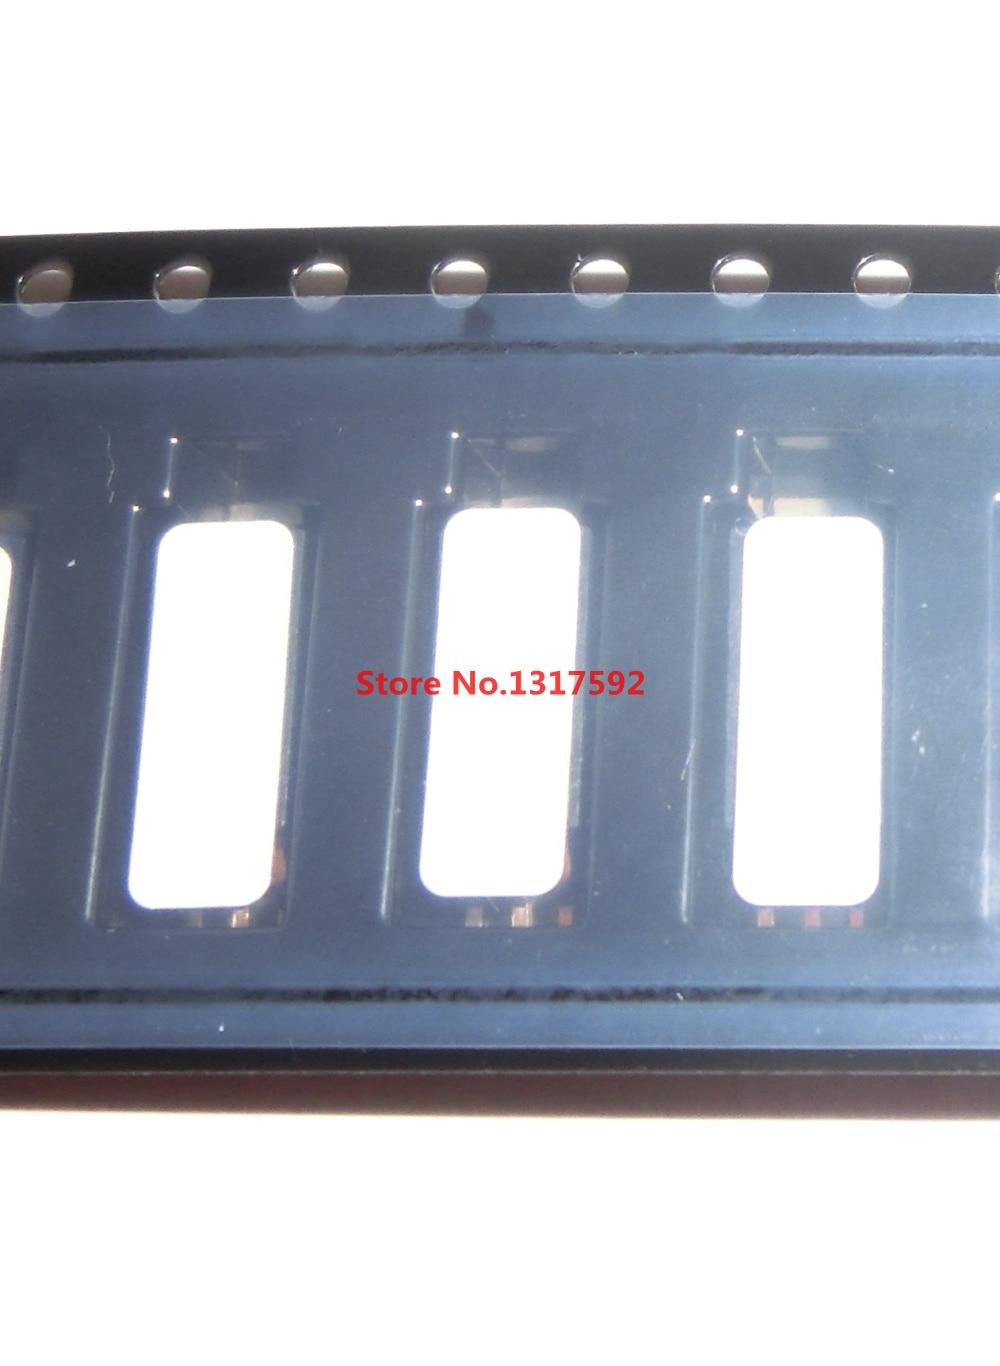 1PCS Humidity Sensor HIH5030-001 HIH-5030-001